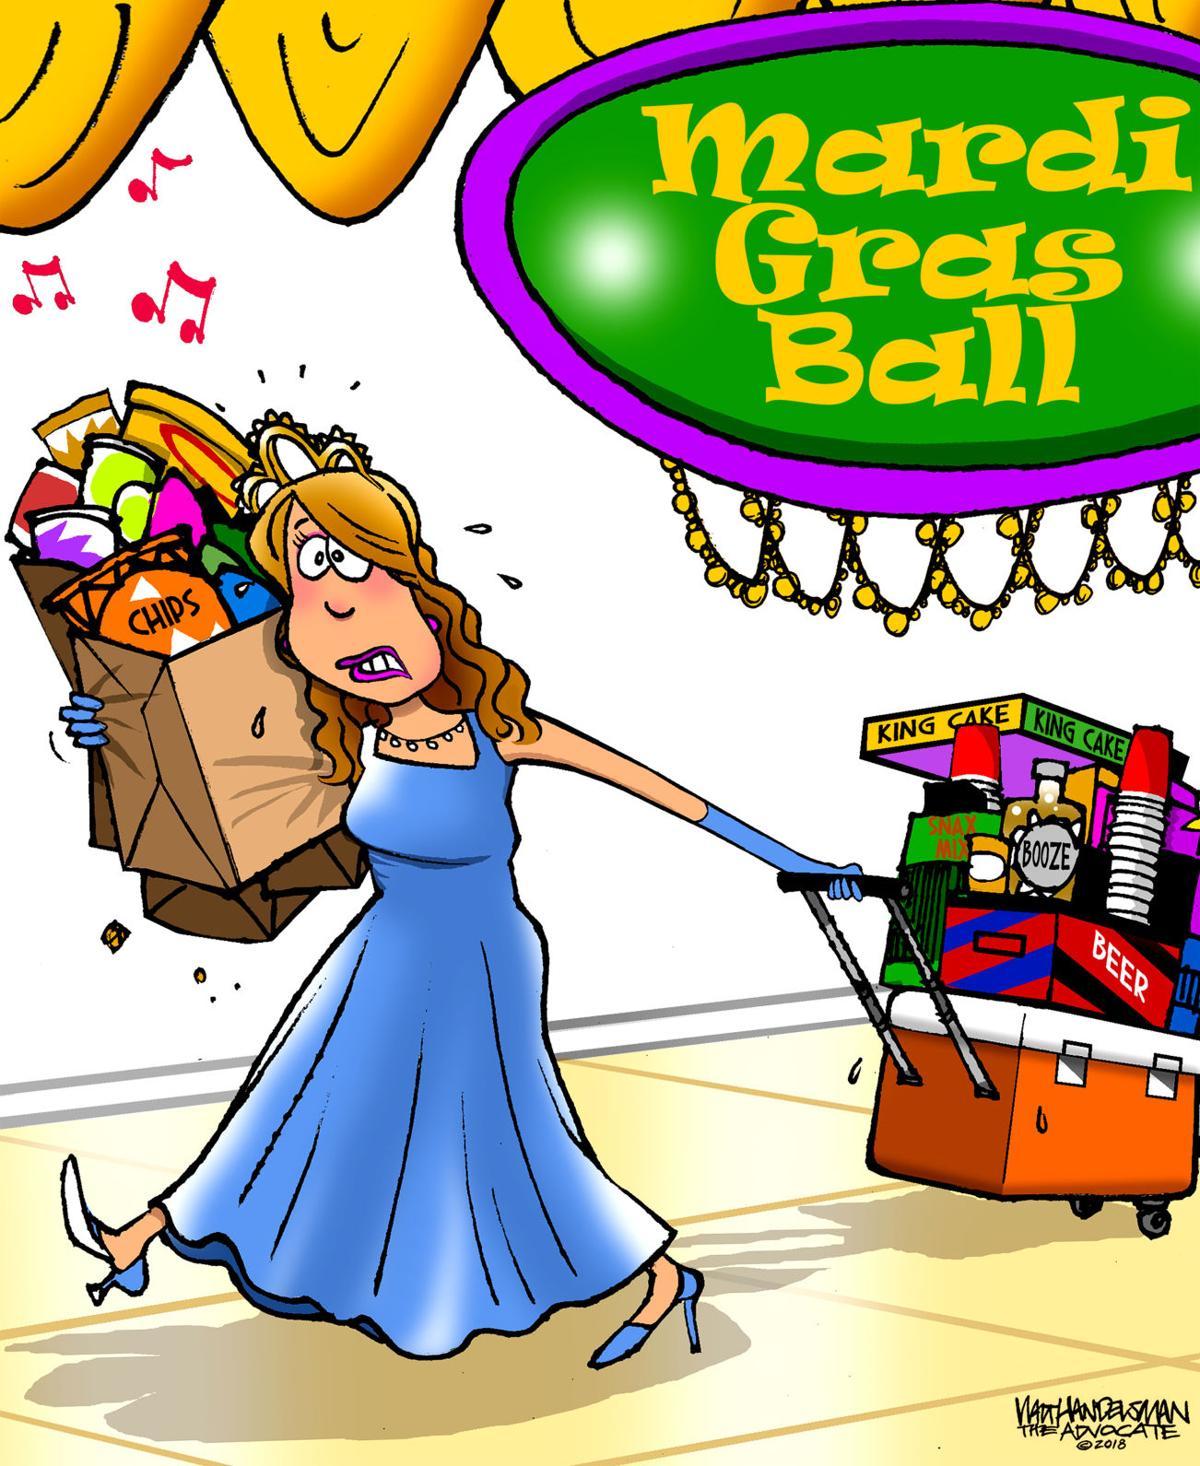 Mardi Gras ball.jpg